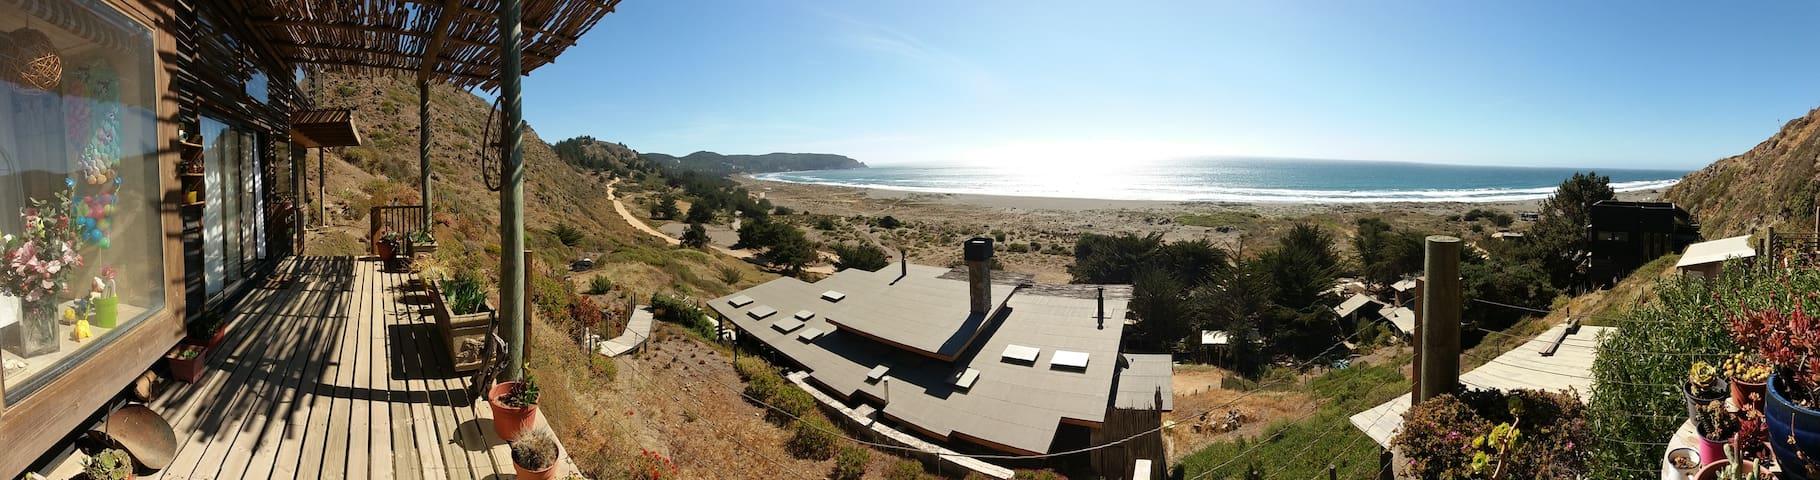 Casa en Puertecillo, con vista espectacular al mar